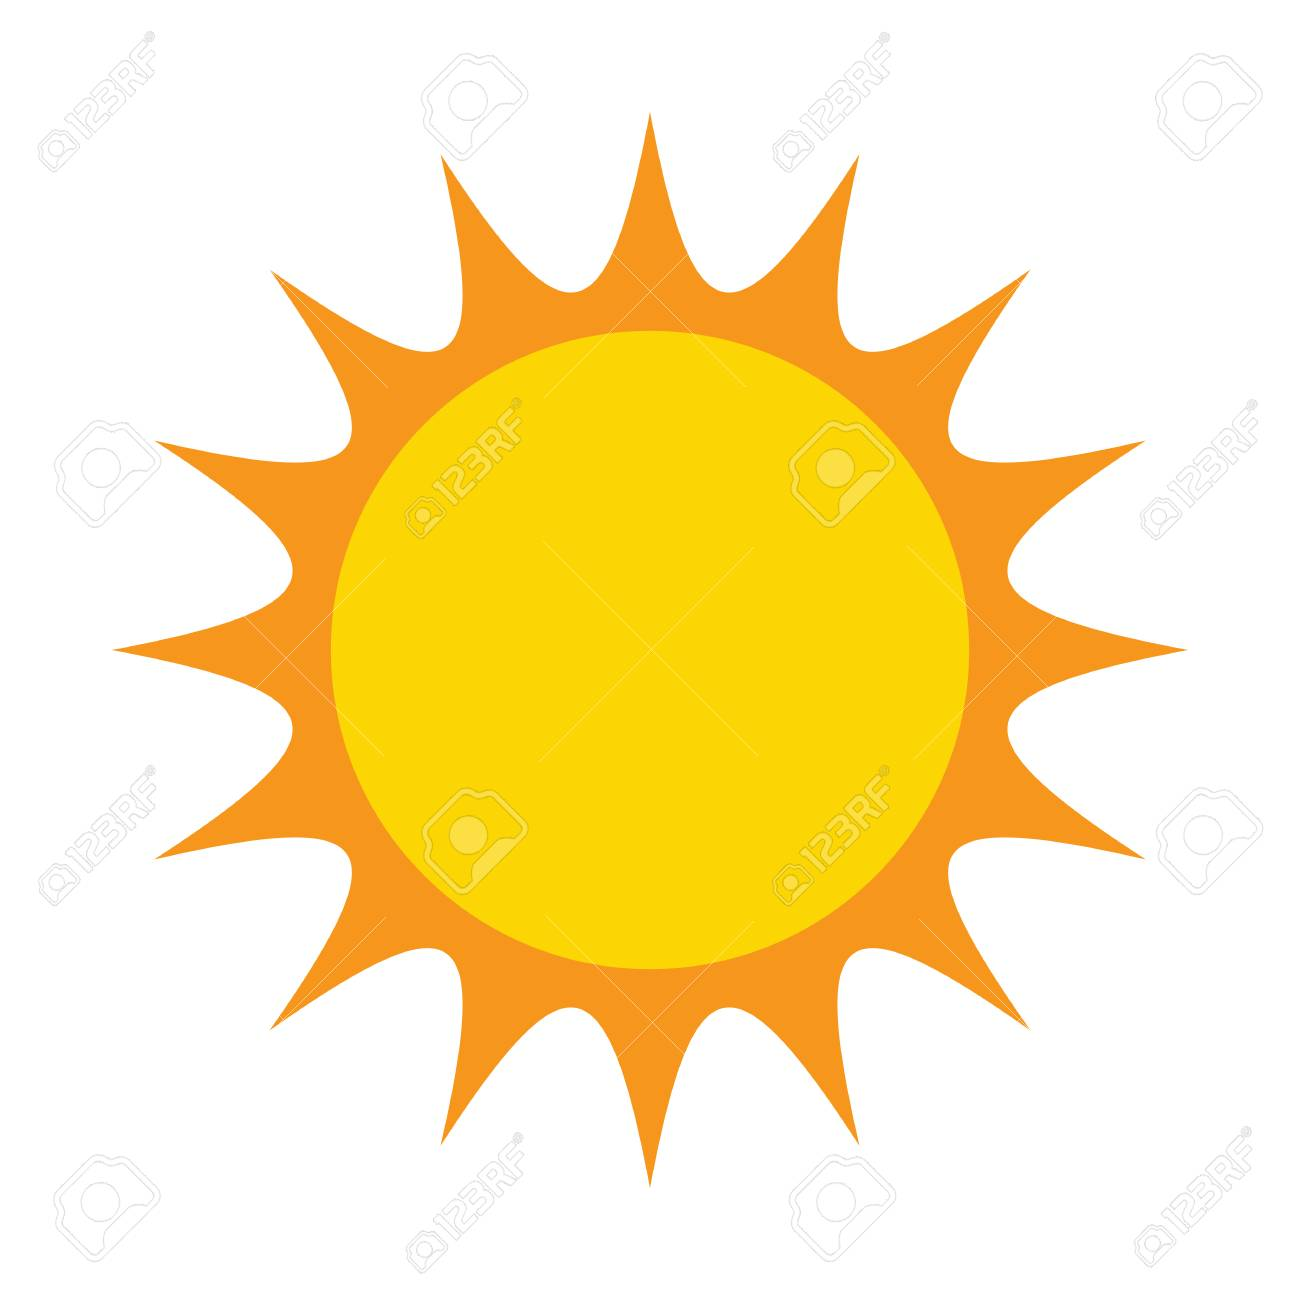 sun vector symbol icon design illustration isolated on white rh 123rf com sun vector png sun vector png